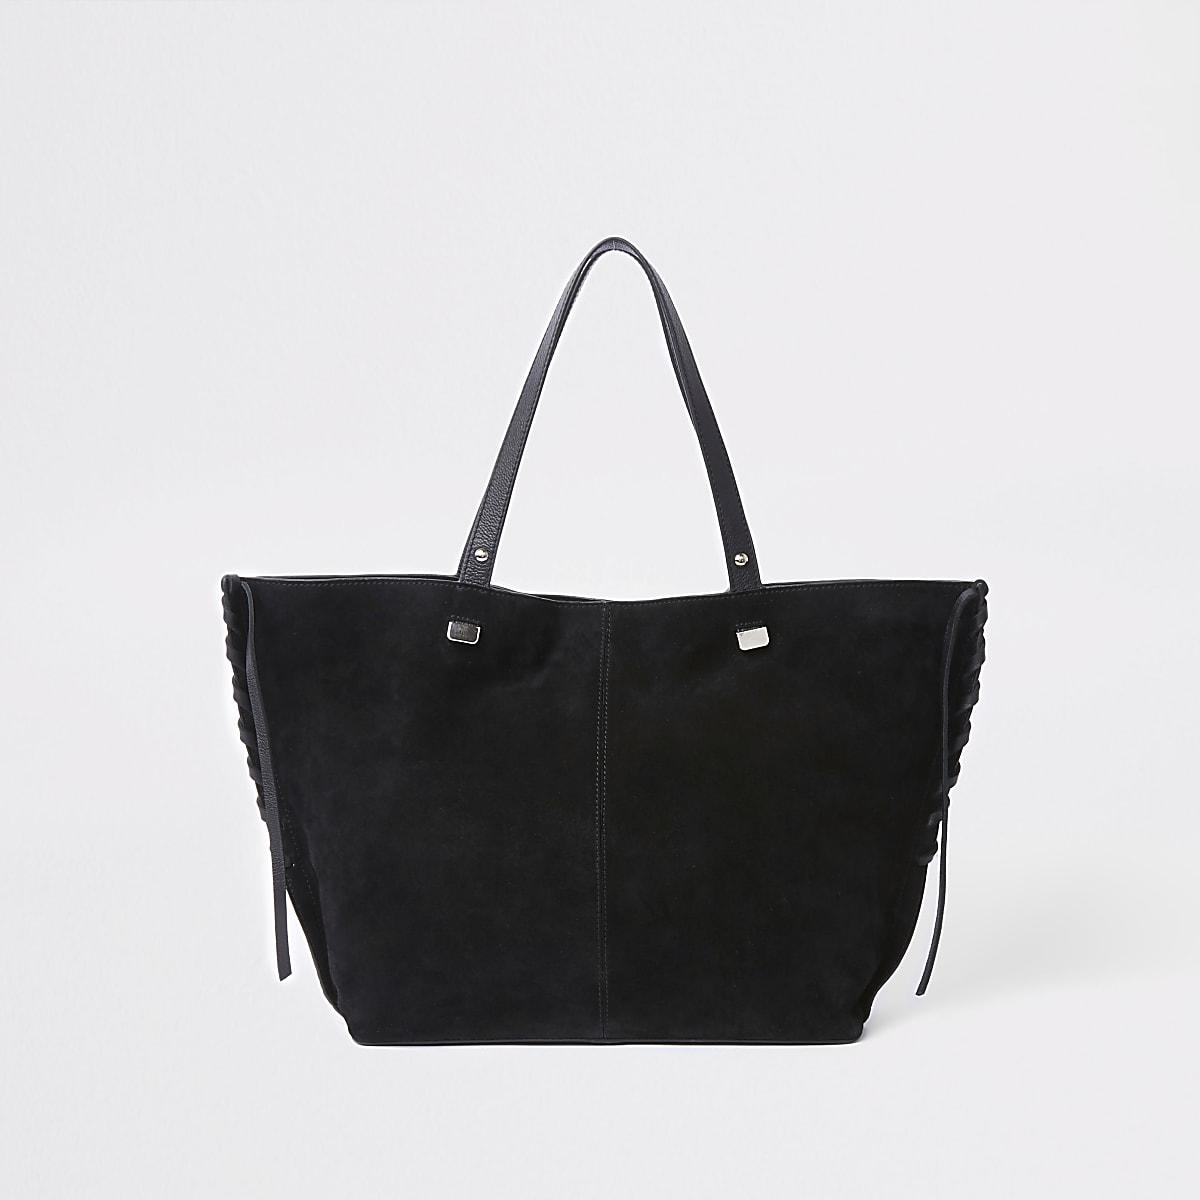 Schwarze Tote Bag aus Wildlederimitat